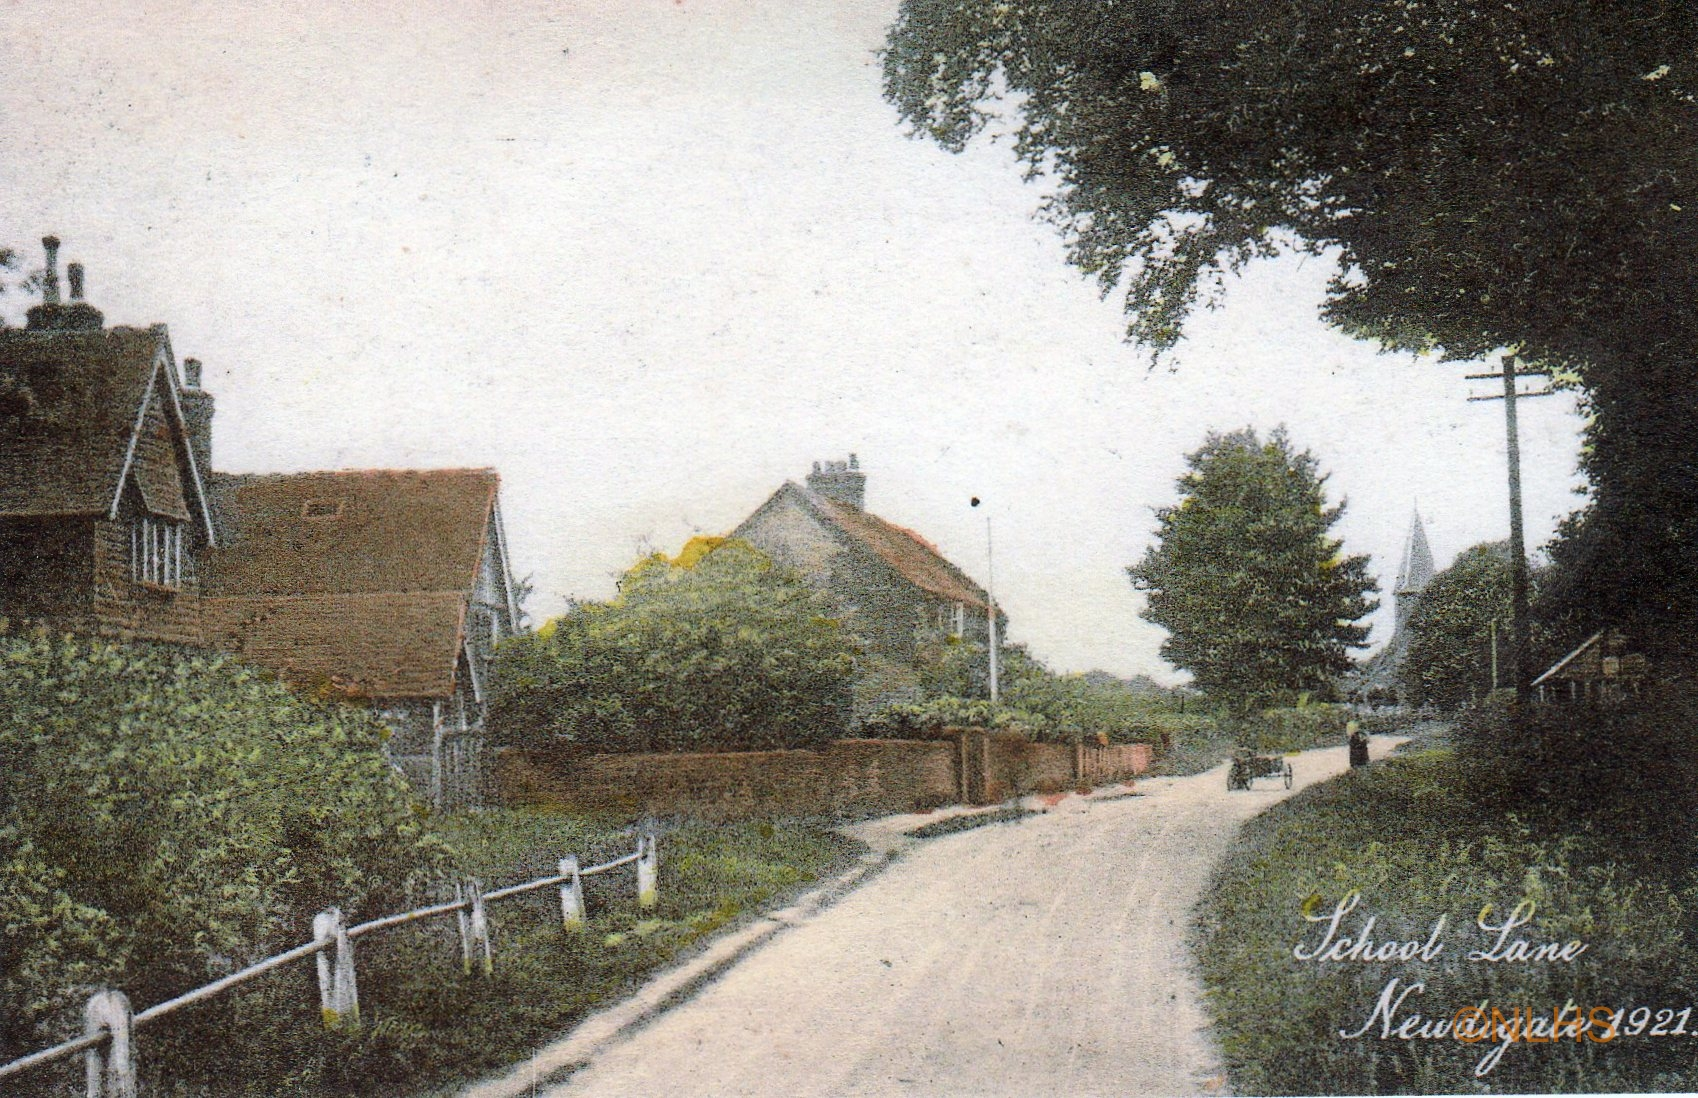 School Lane - 4